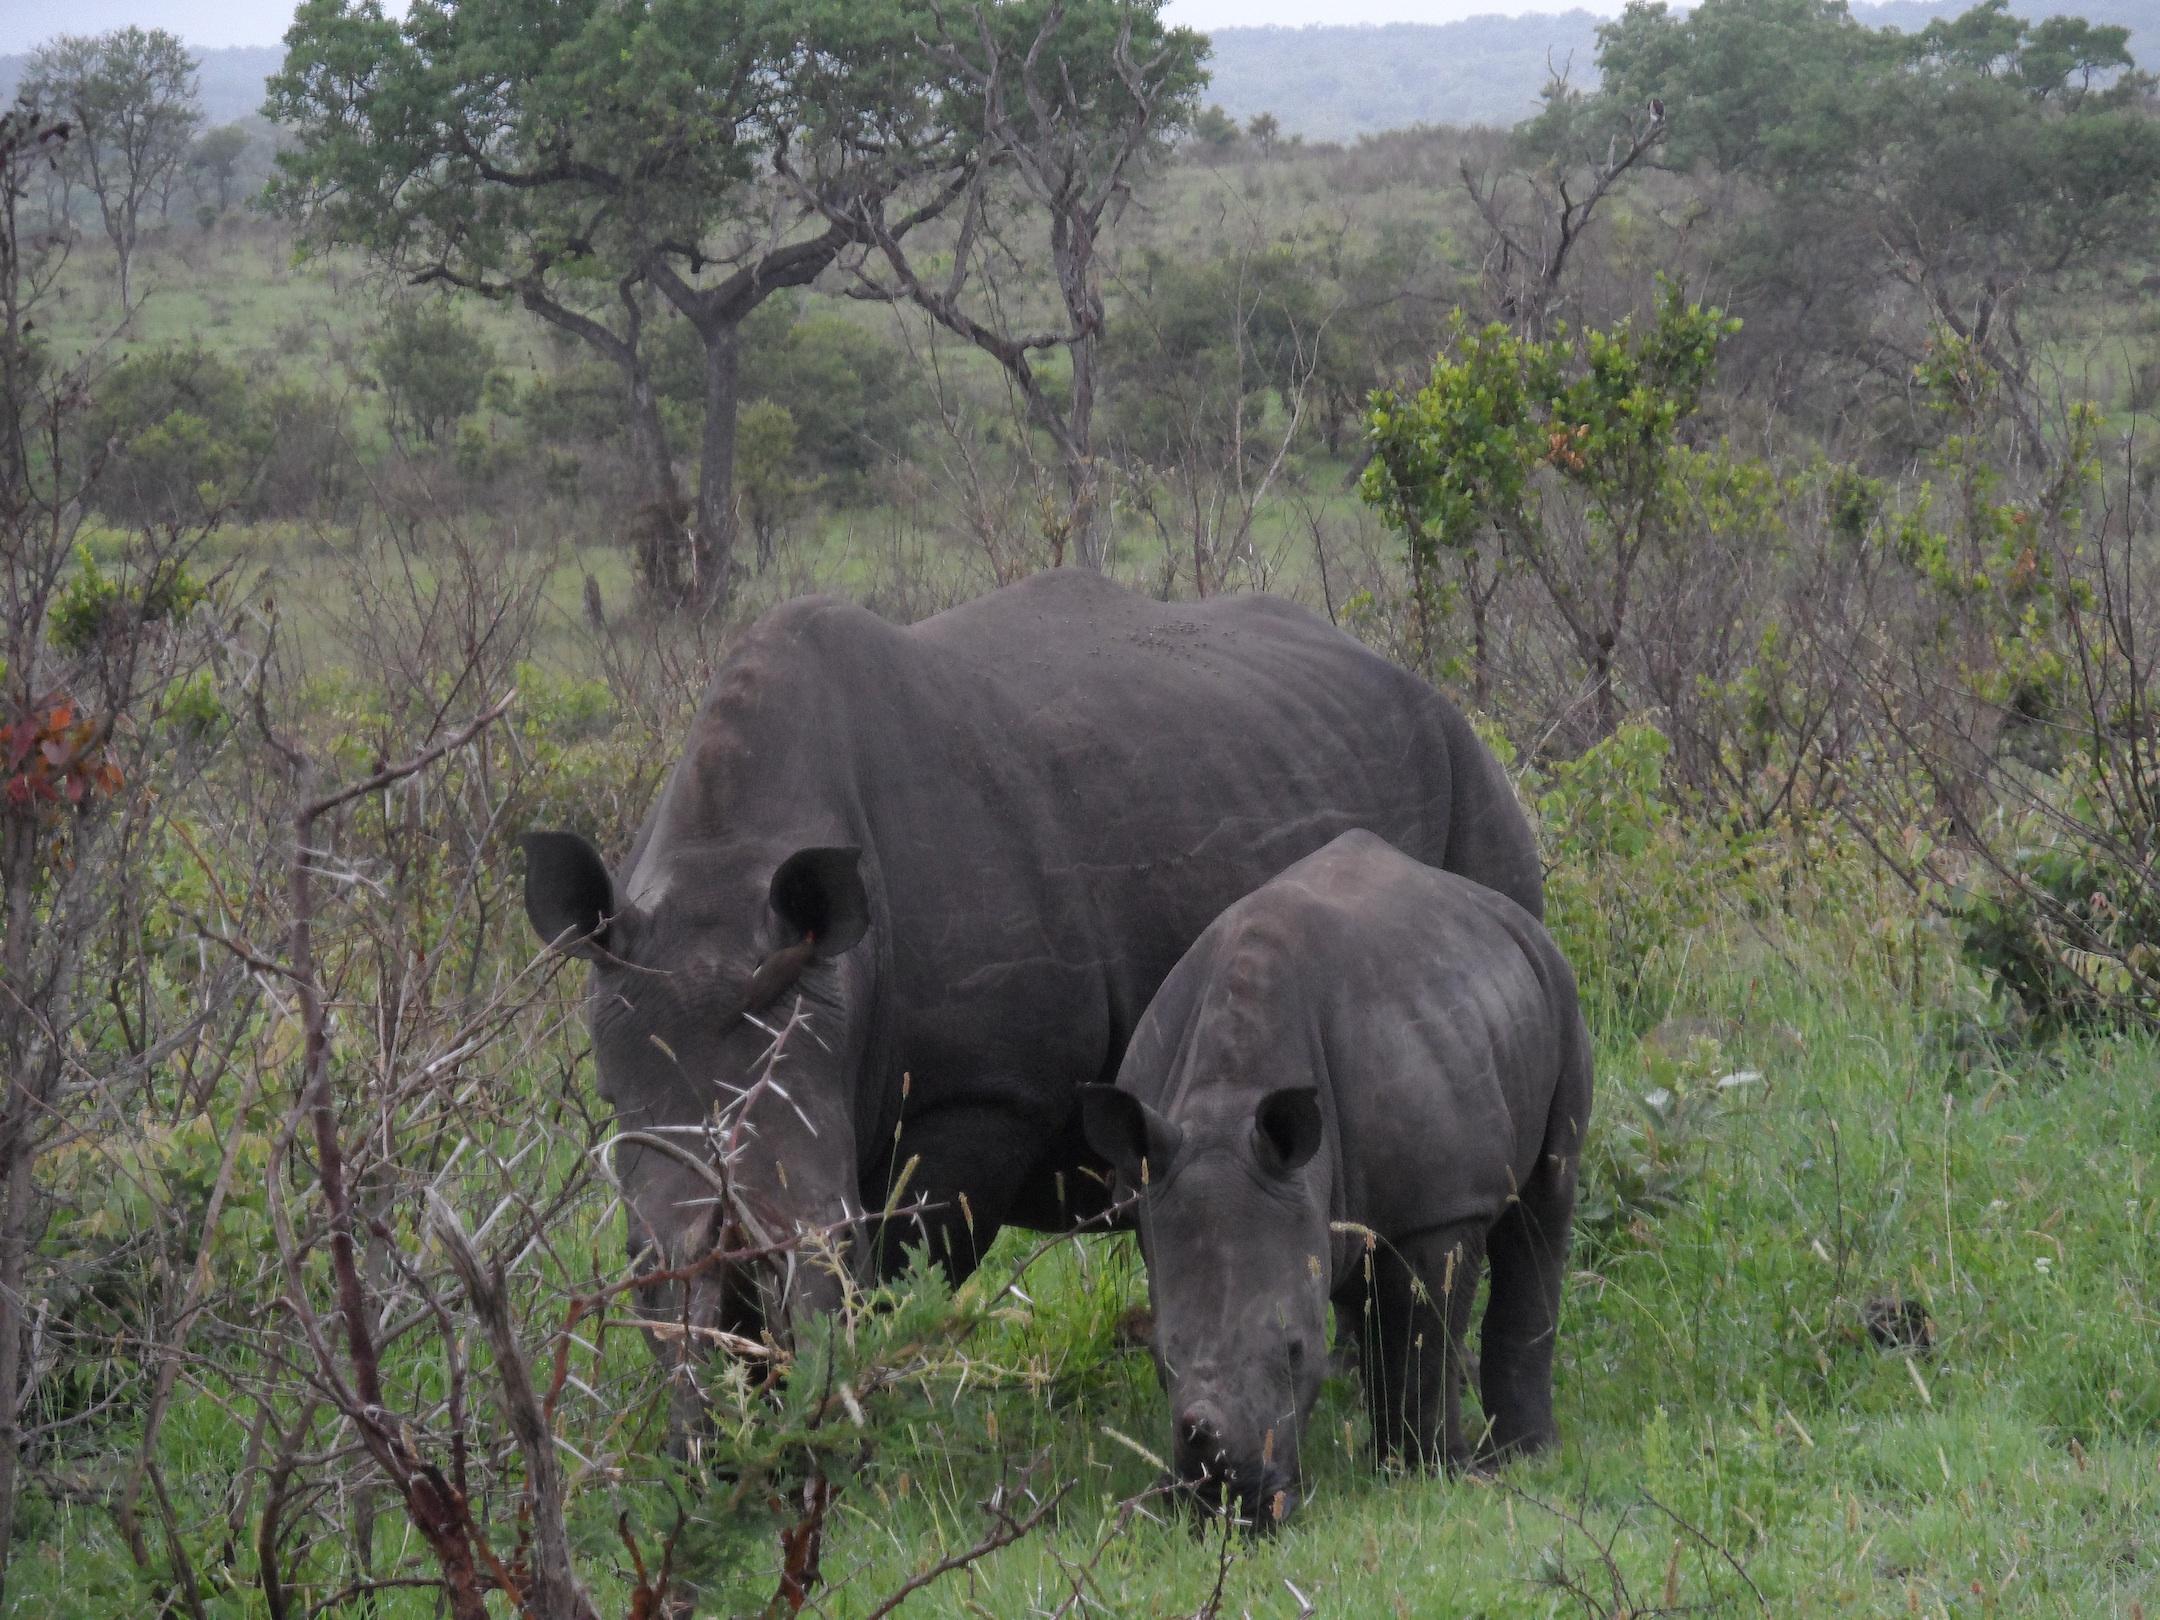 2013-01-29-MotherandSonRhinocerosjpg.jpg